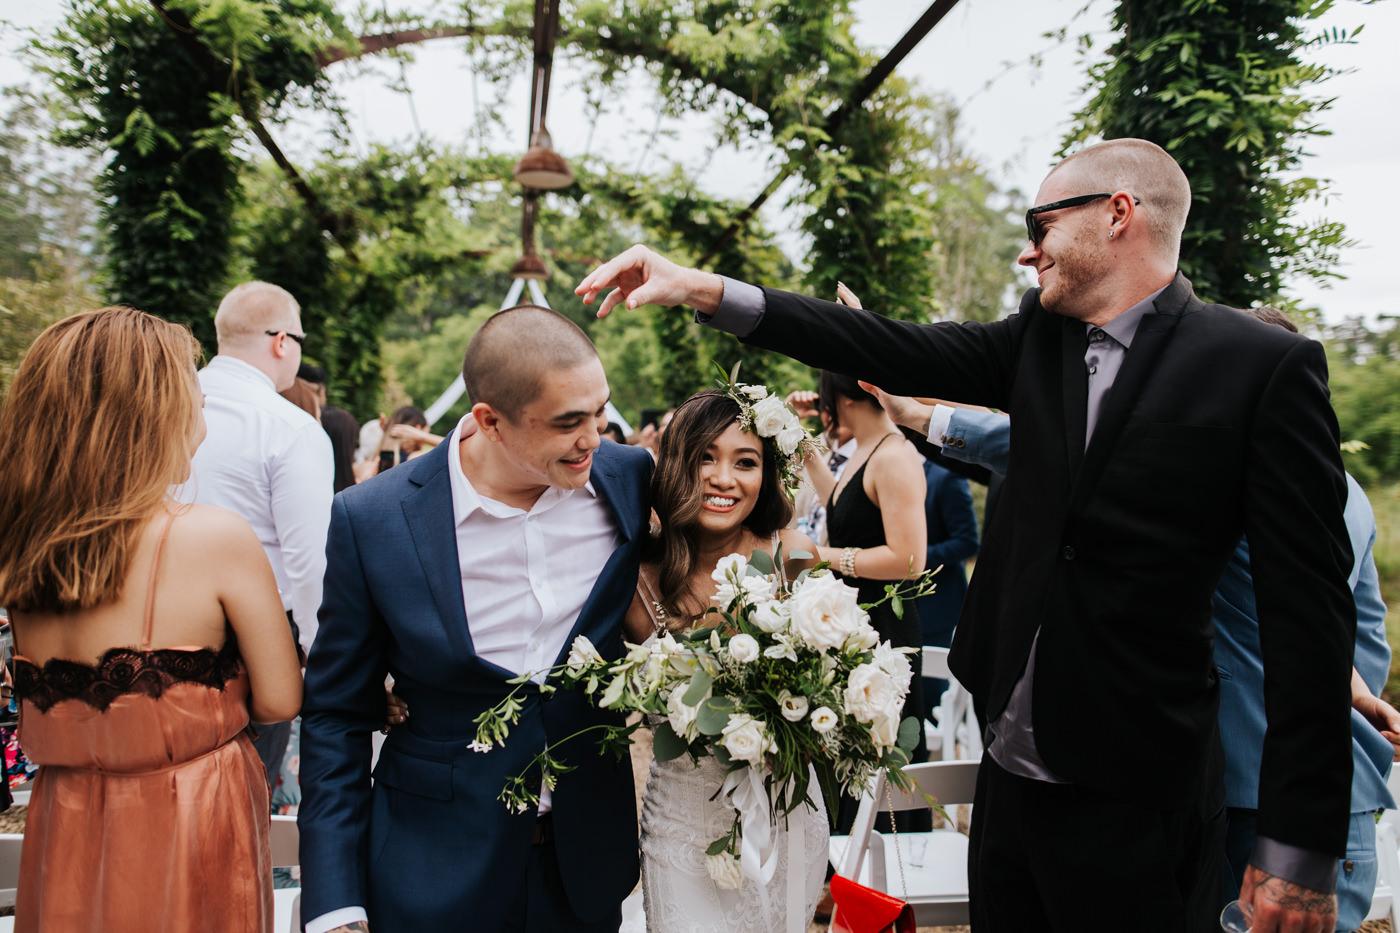 Nick & Vanezza - Fernbank Farm Wedding - Samantha Heather Photography-83.jpg